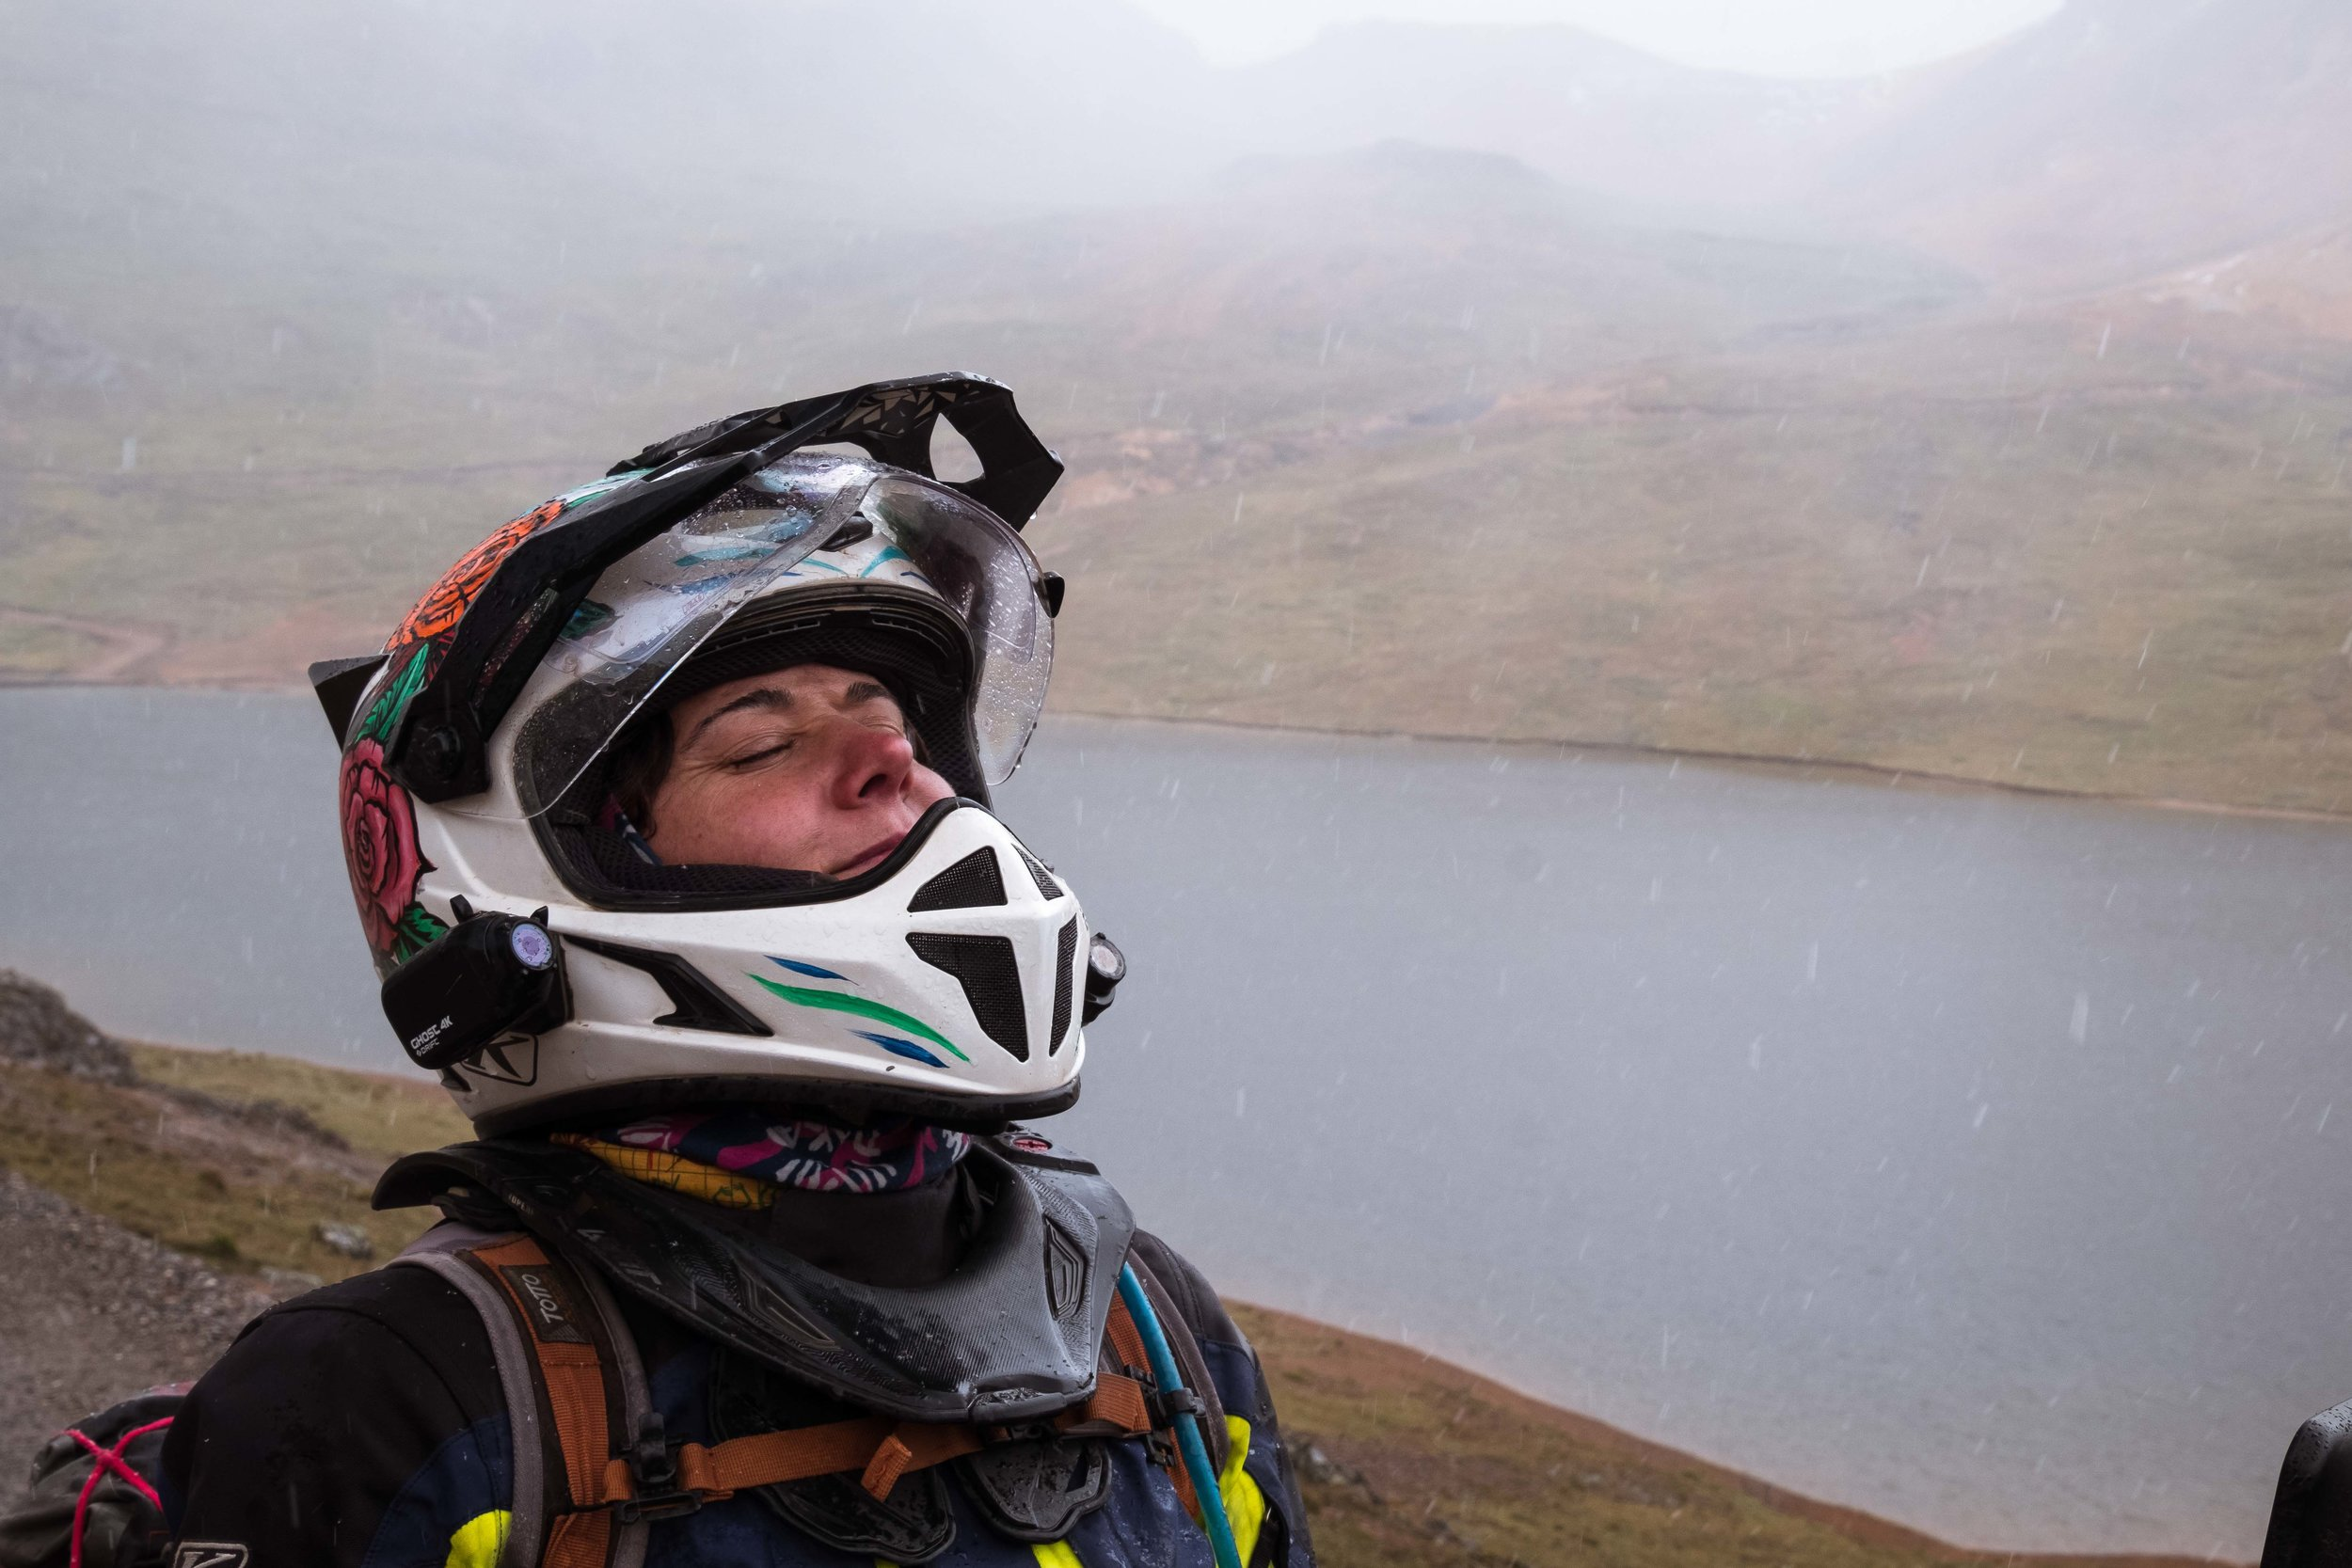 michnus-elsebie-olivier-pikipiki-overland-adventure-rider-radio-motorcycle-podcast-10.jpg